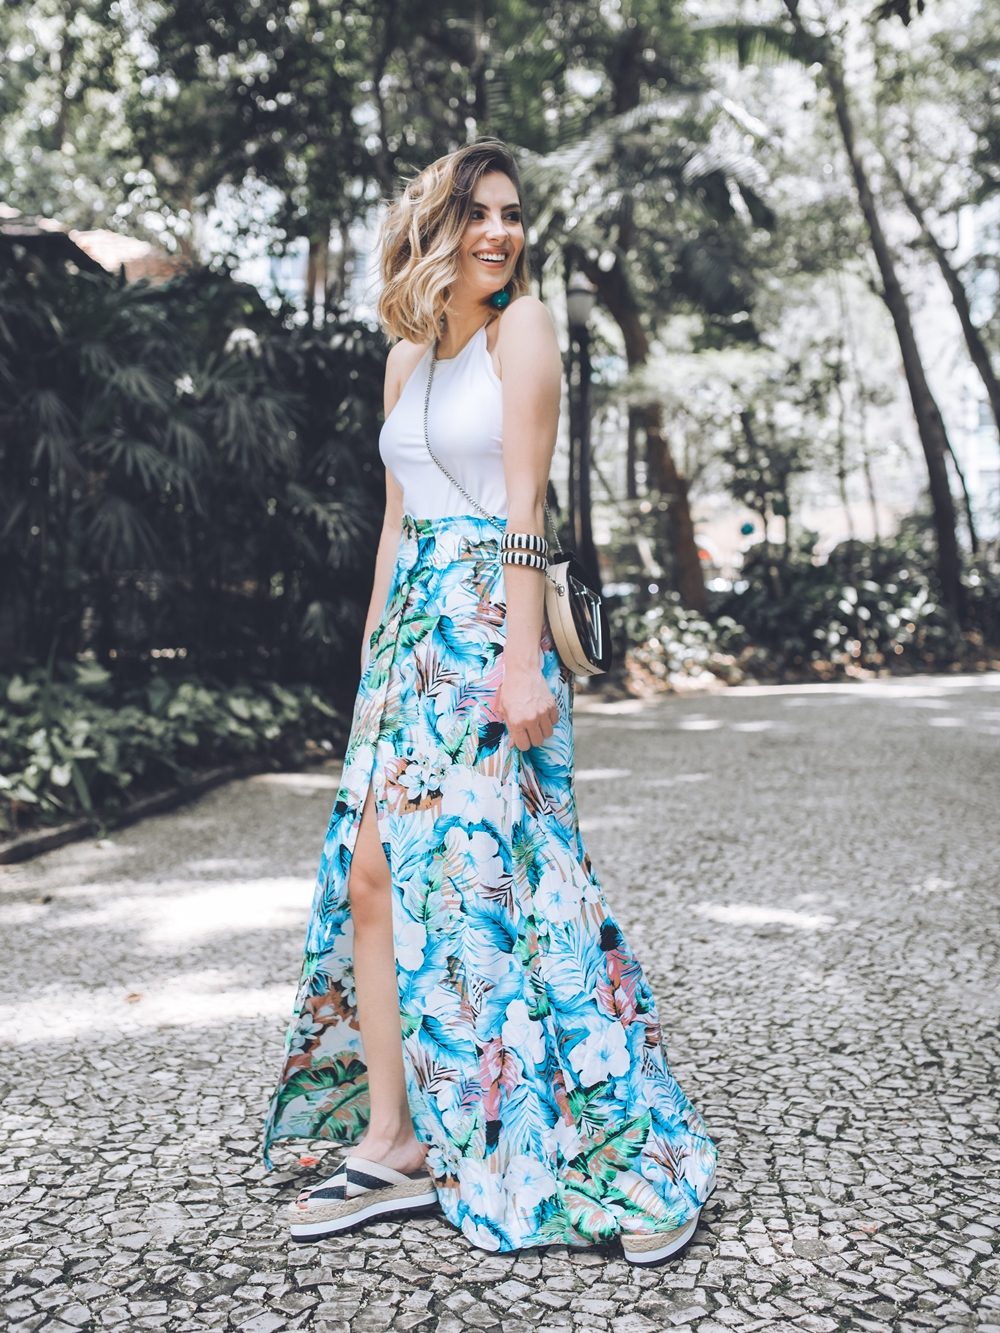 look-body-saia-longa-botoes-estampados-tendencia-verao-2016-2017-blog-vanduarte-3